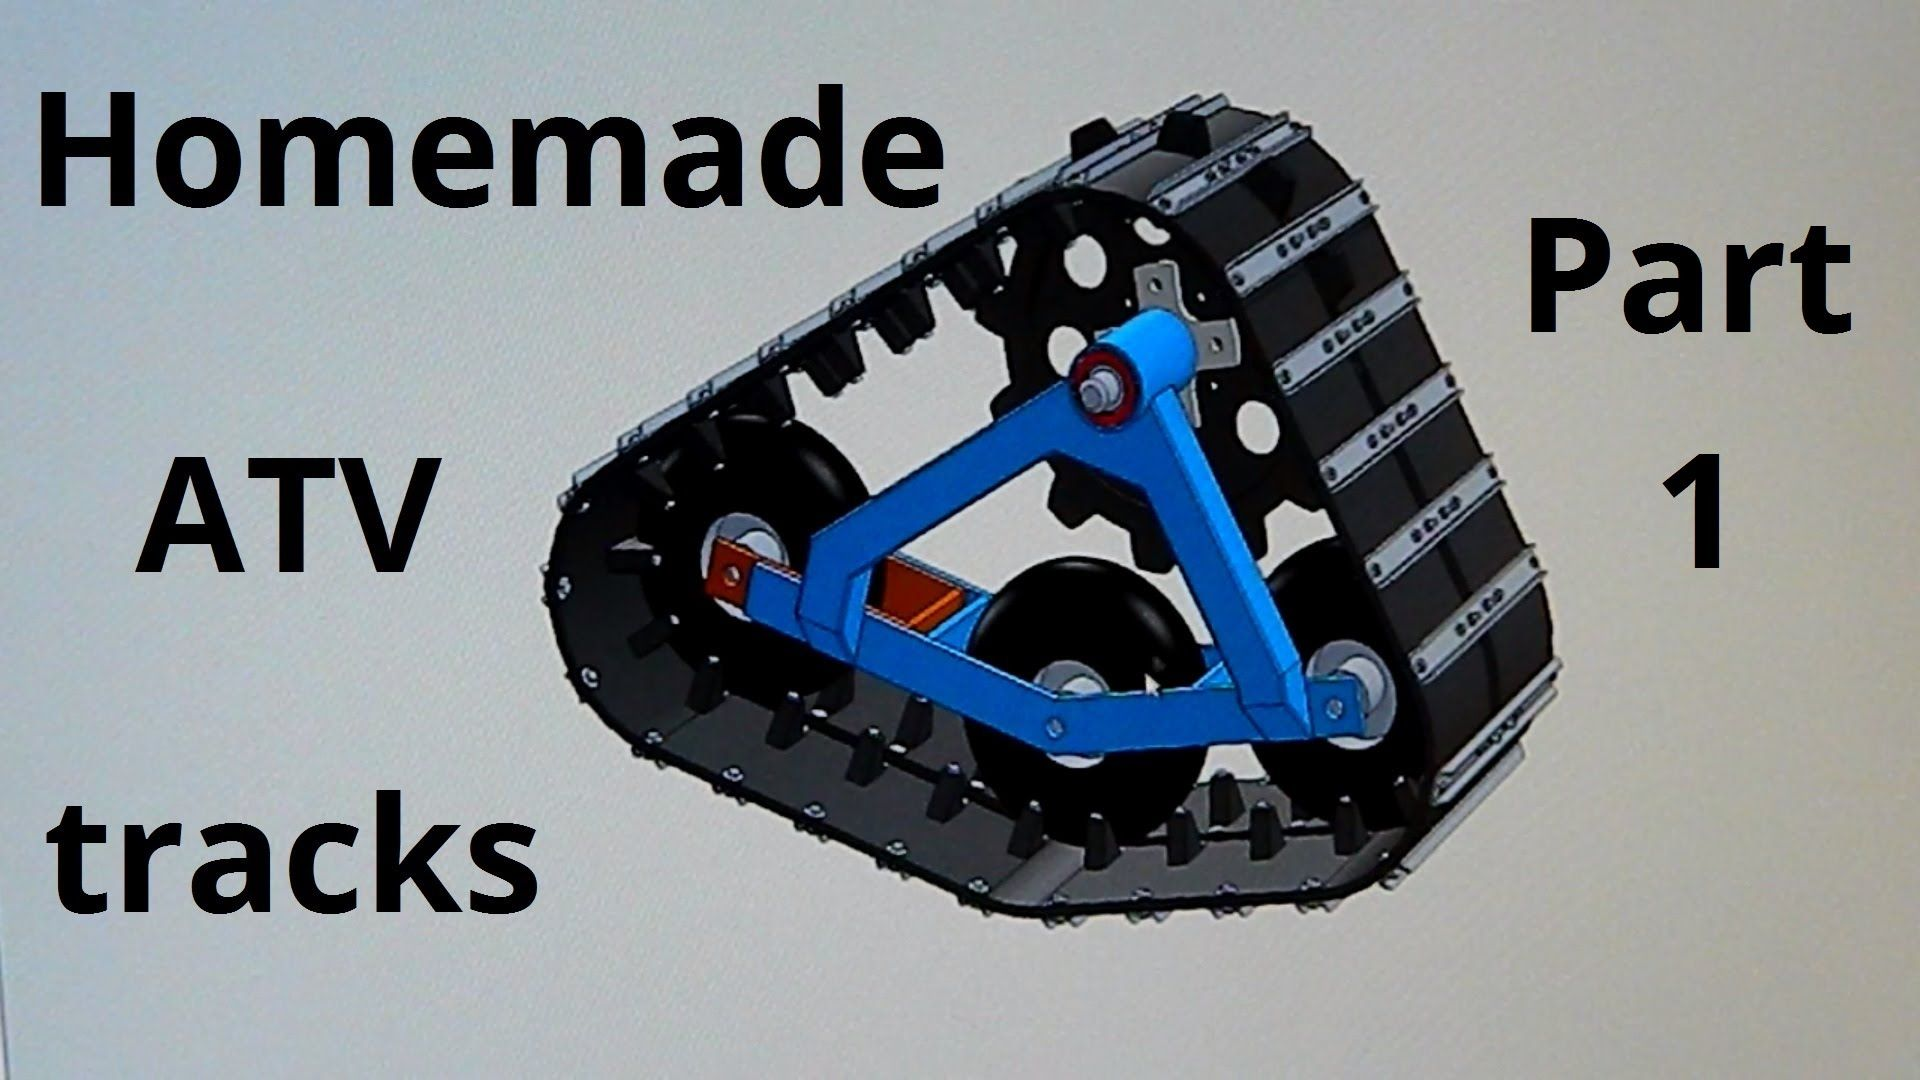 hight resolution of homemade atv tracks part 1